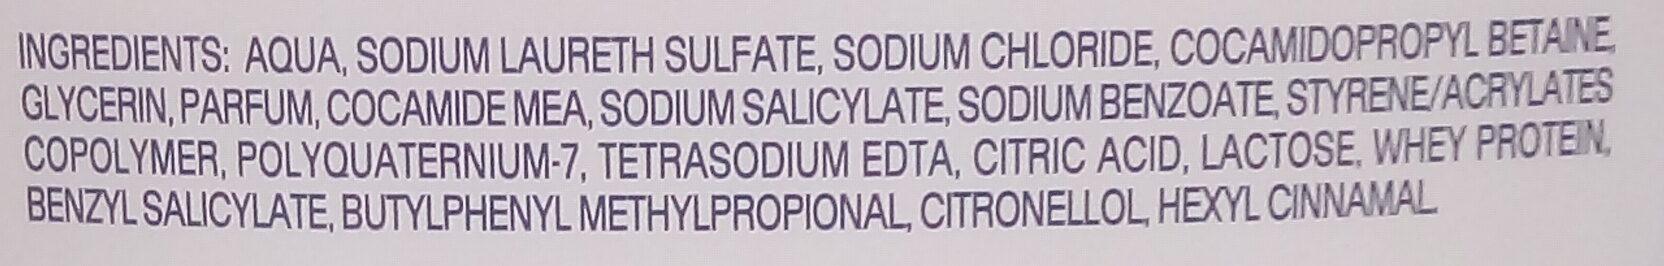 GEL DOUCHE CREME - Ingredients